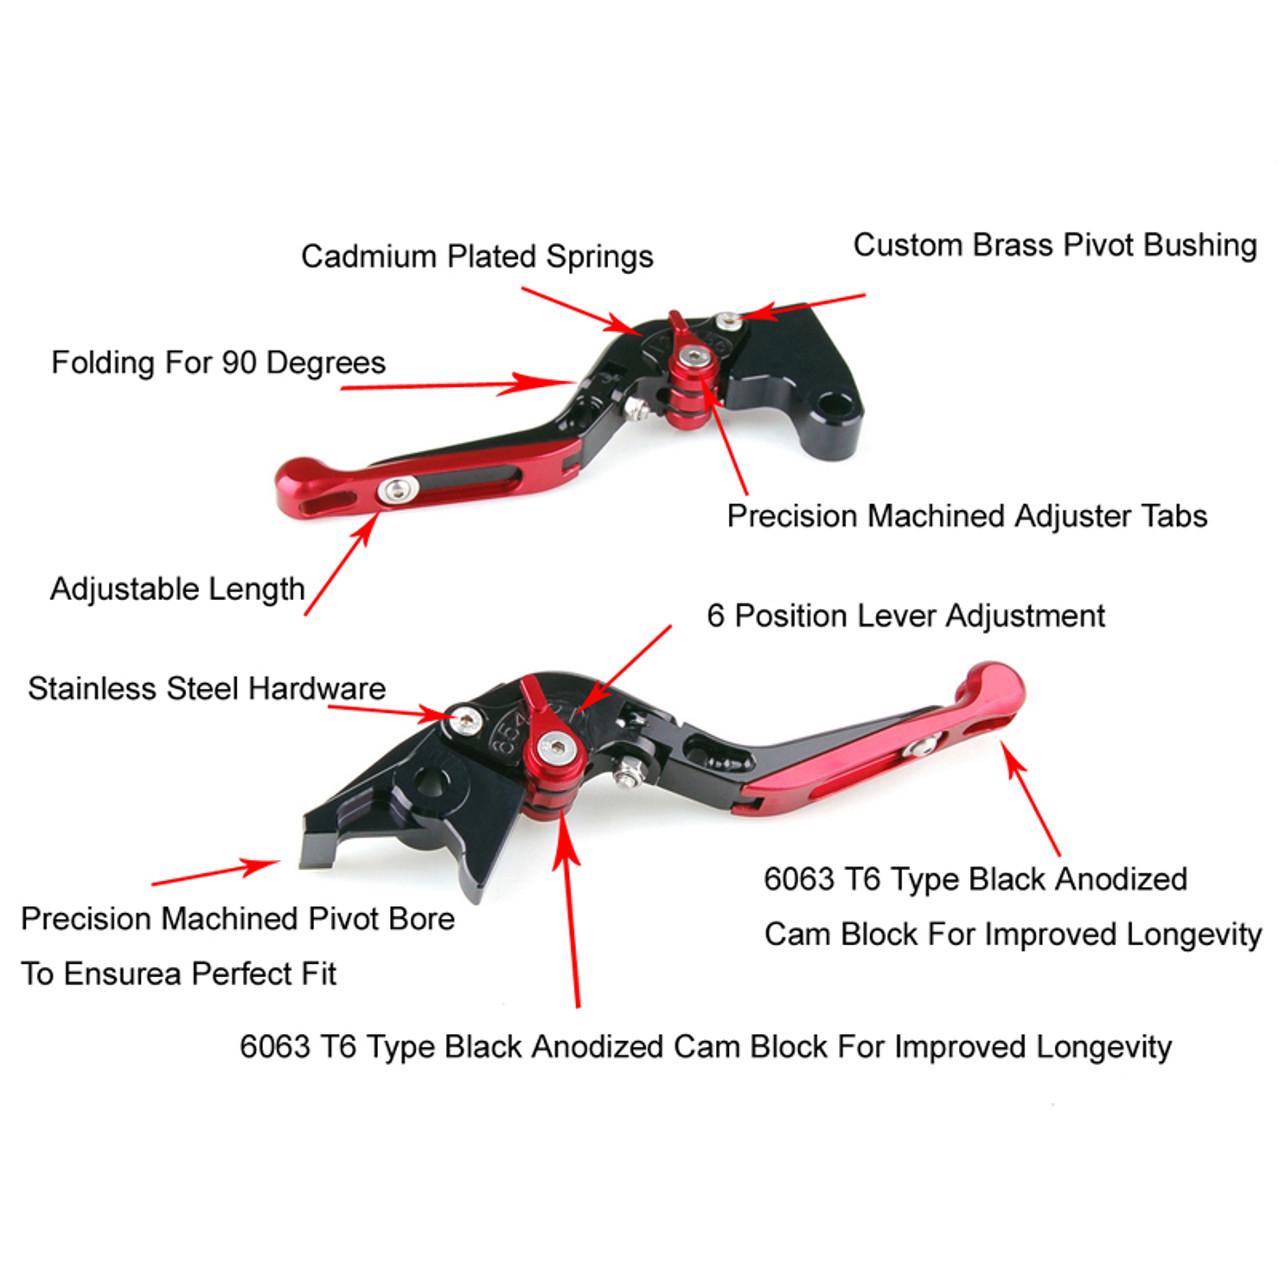 Staff Length Adjustable Brake Clutch Levers Ducati 996 998 /B/S/R 1999-2003 (DB-80/DC-80)